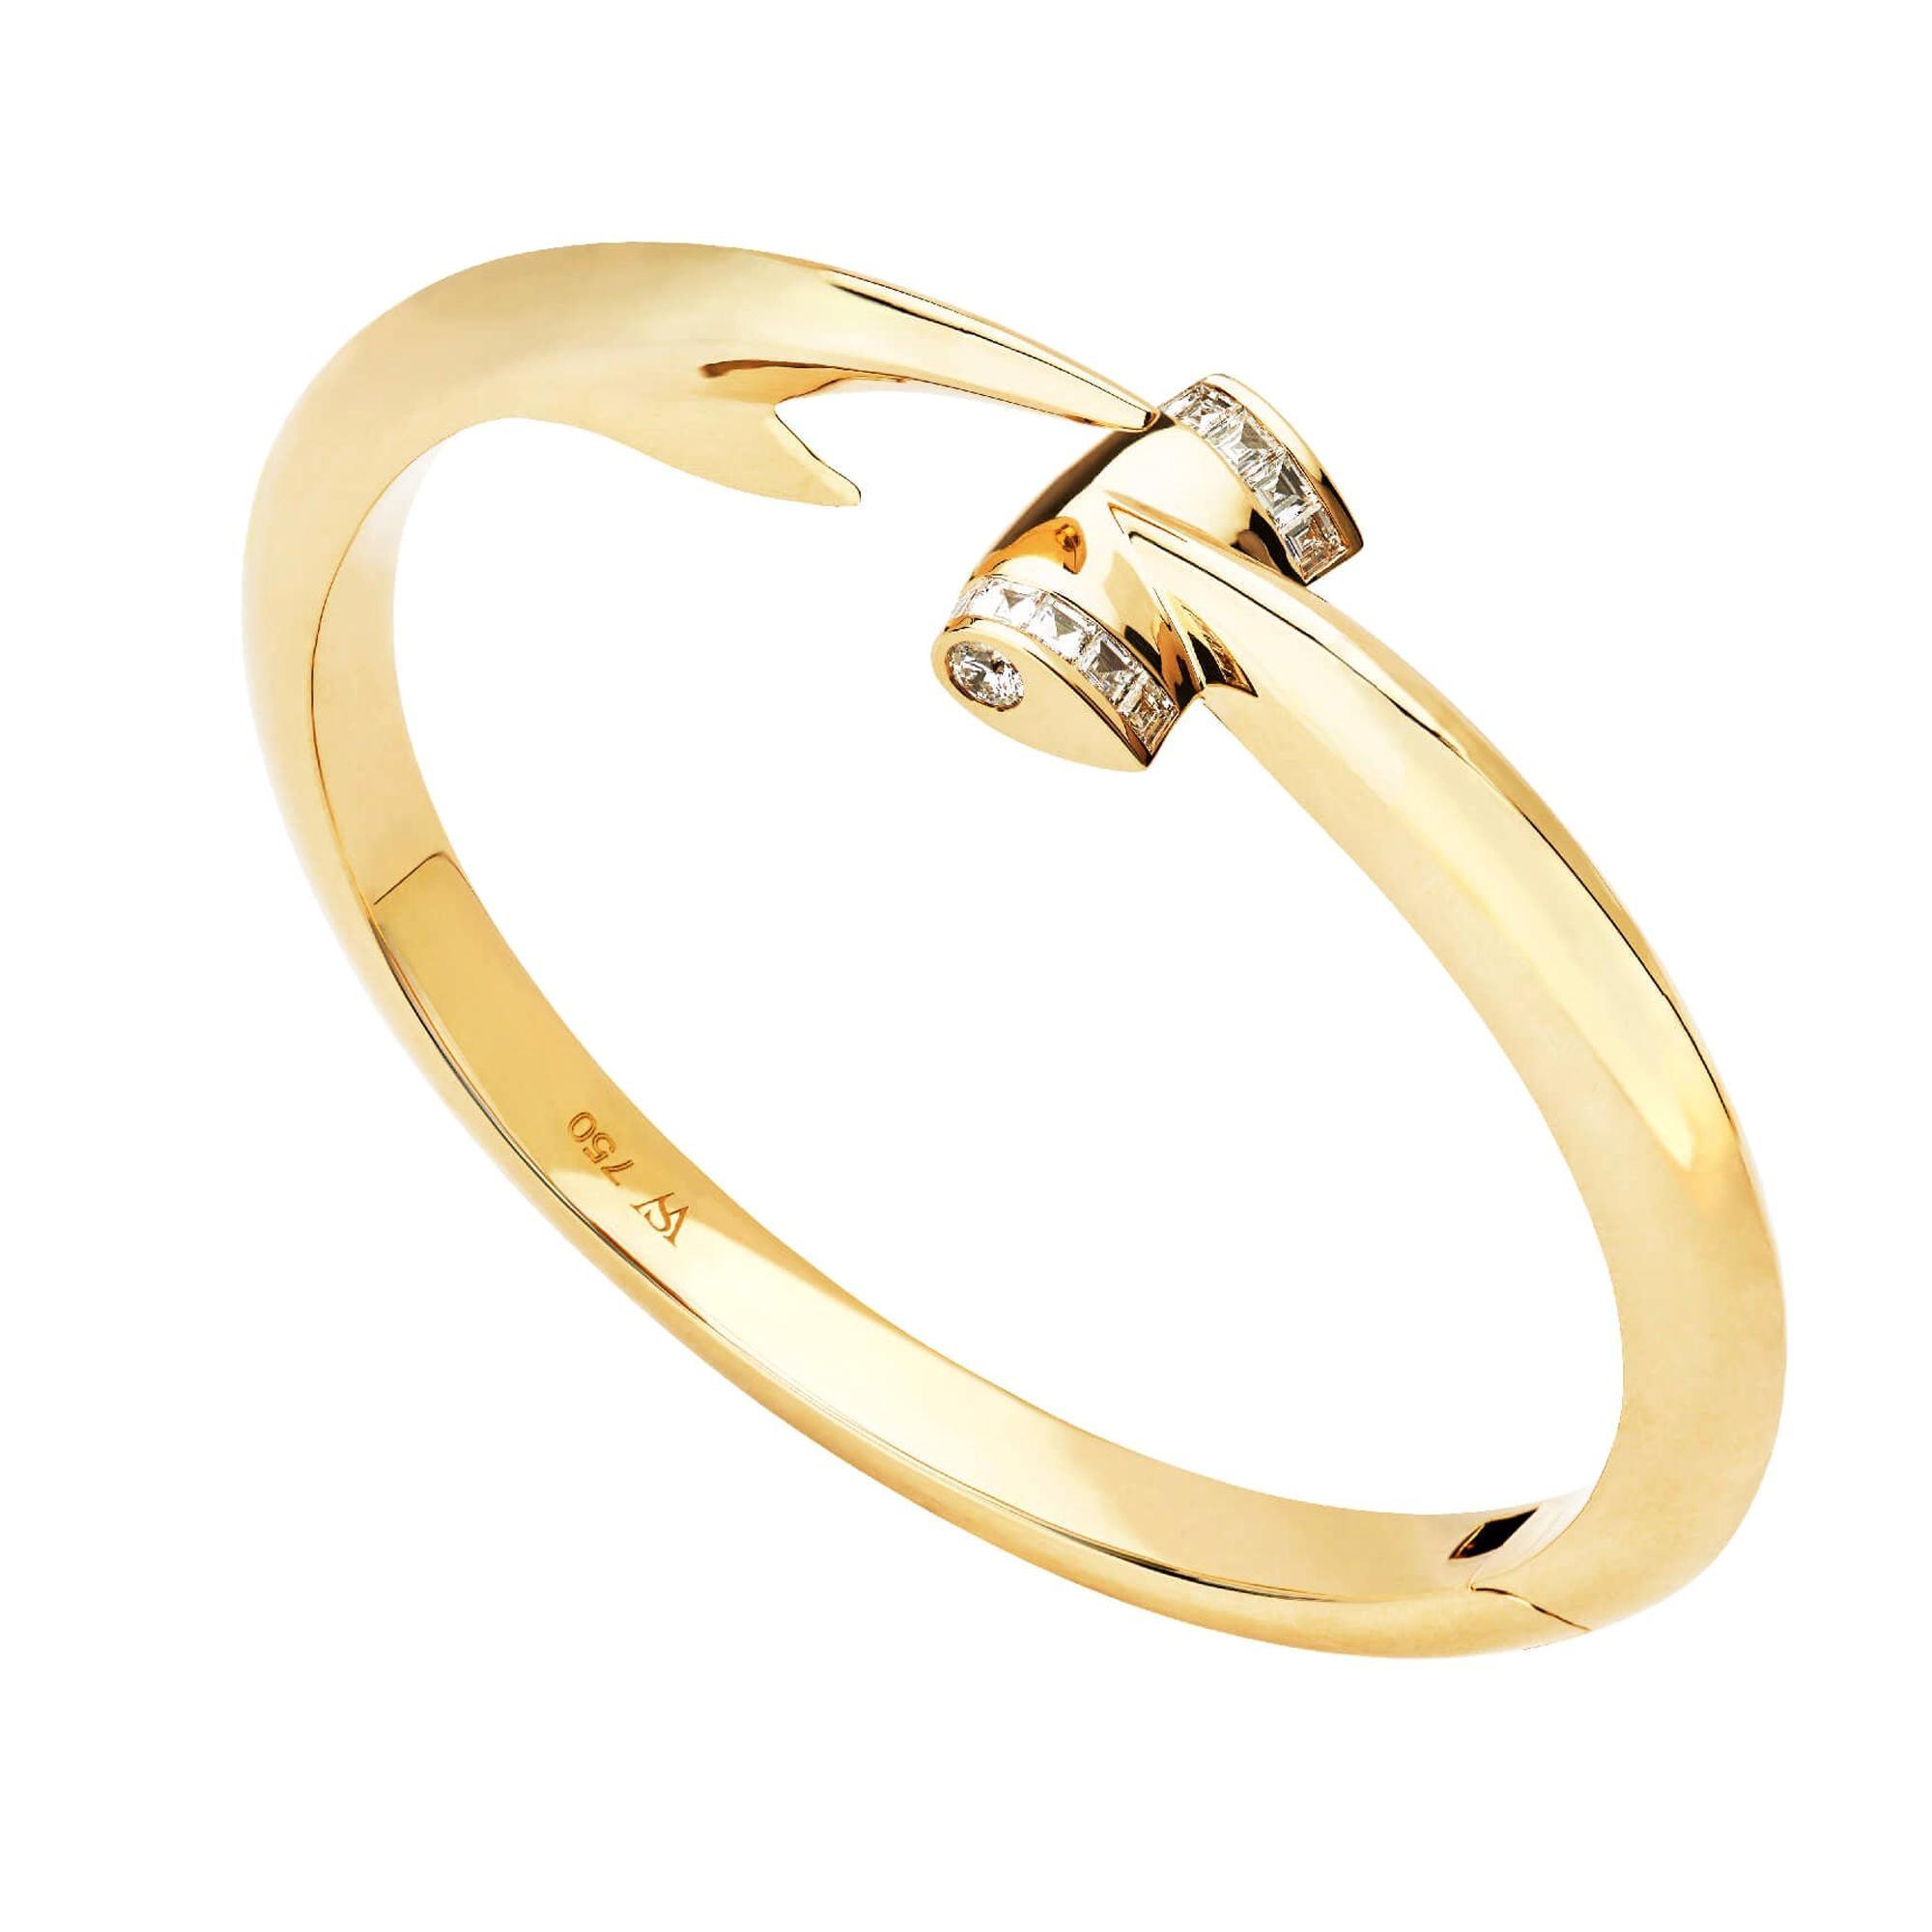 Stephen Webster Hammerhead 18 Karat Yellow Gold and White Diamond Bangle